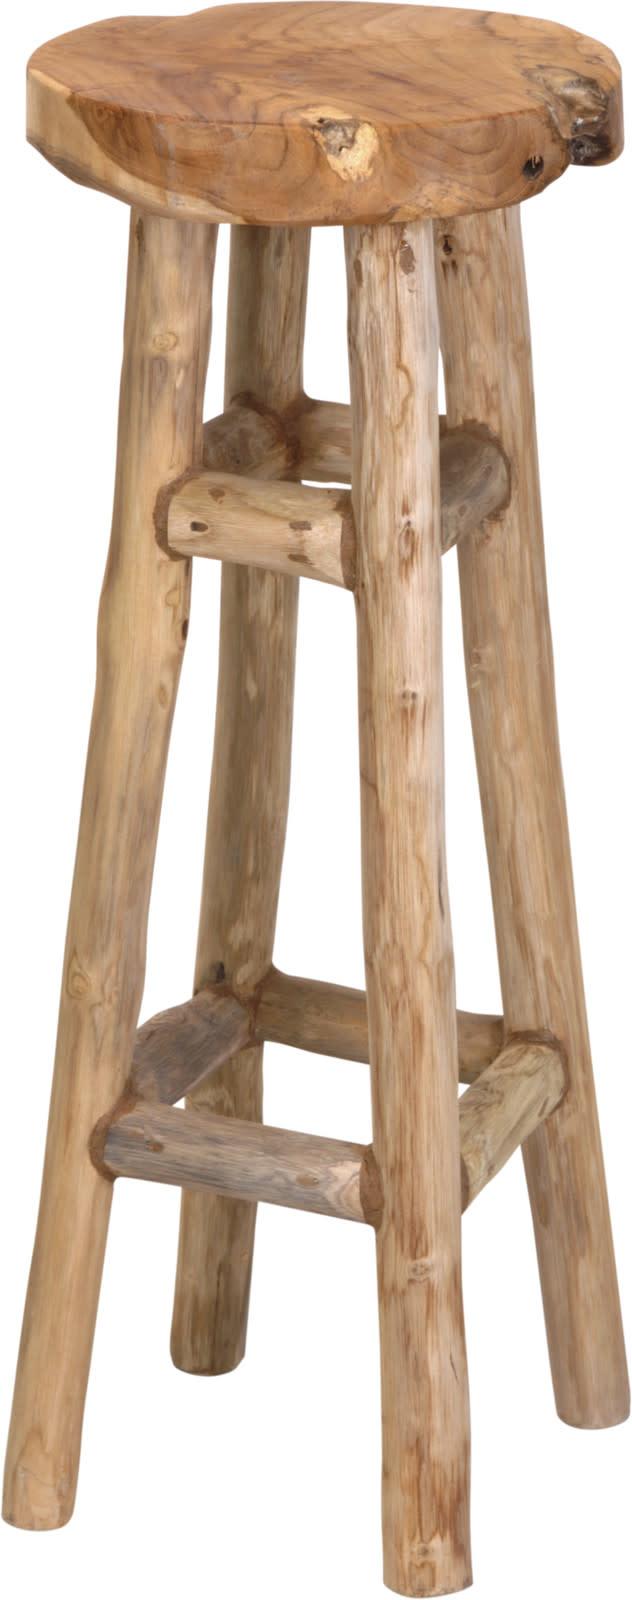 Koopman Bar Stool Teak Wood 30X30X80Cm